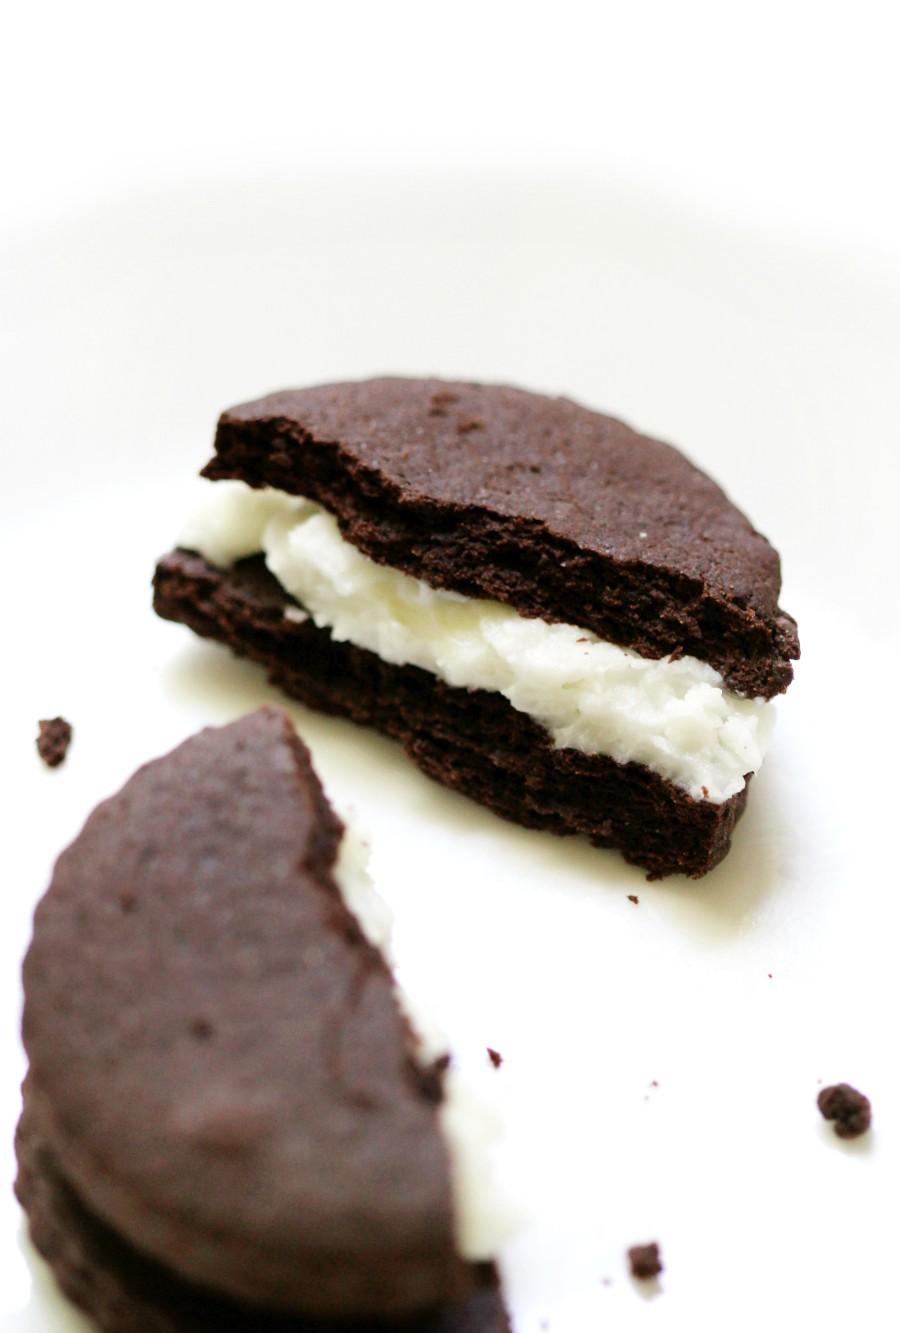 broken-oreo-cookie-close-up